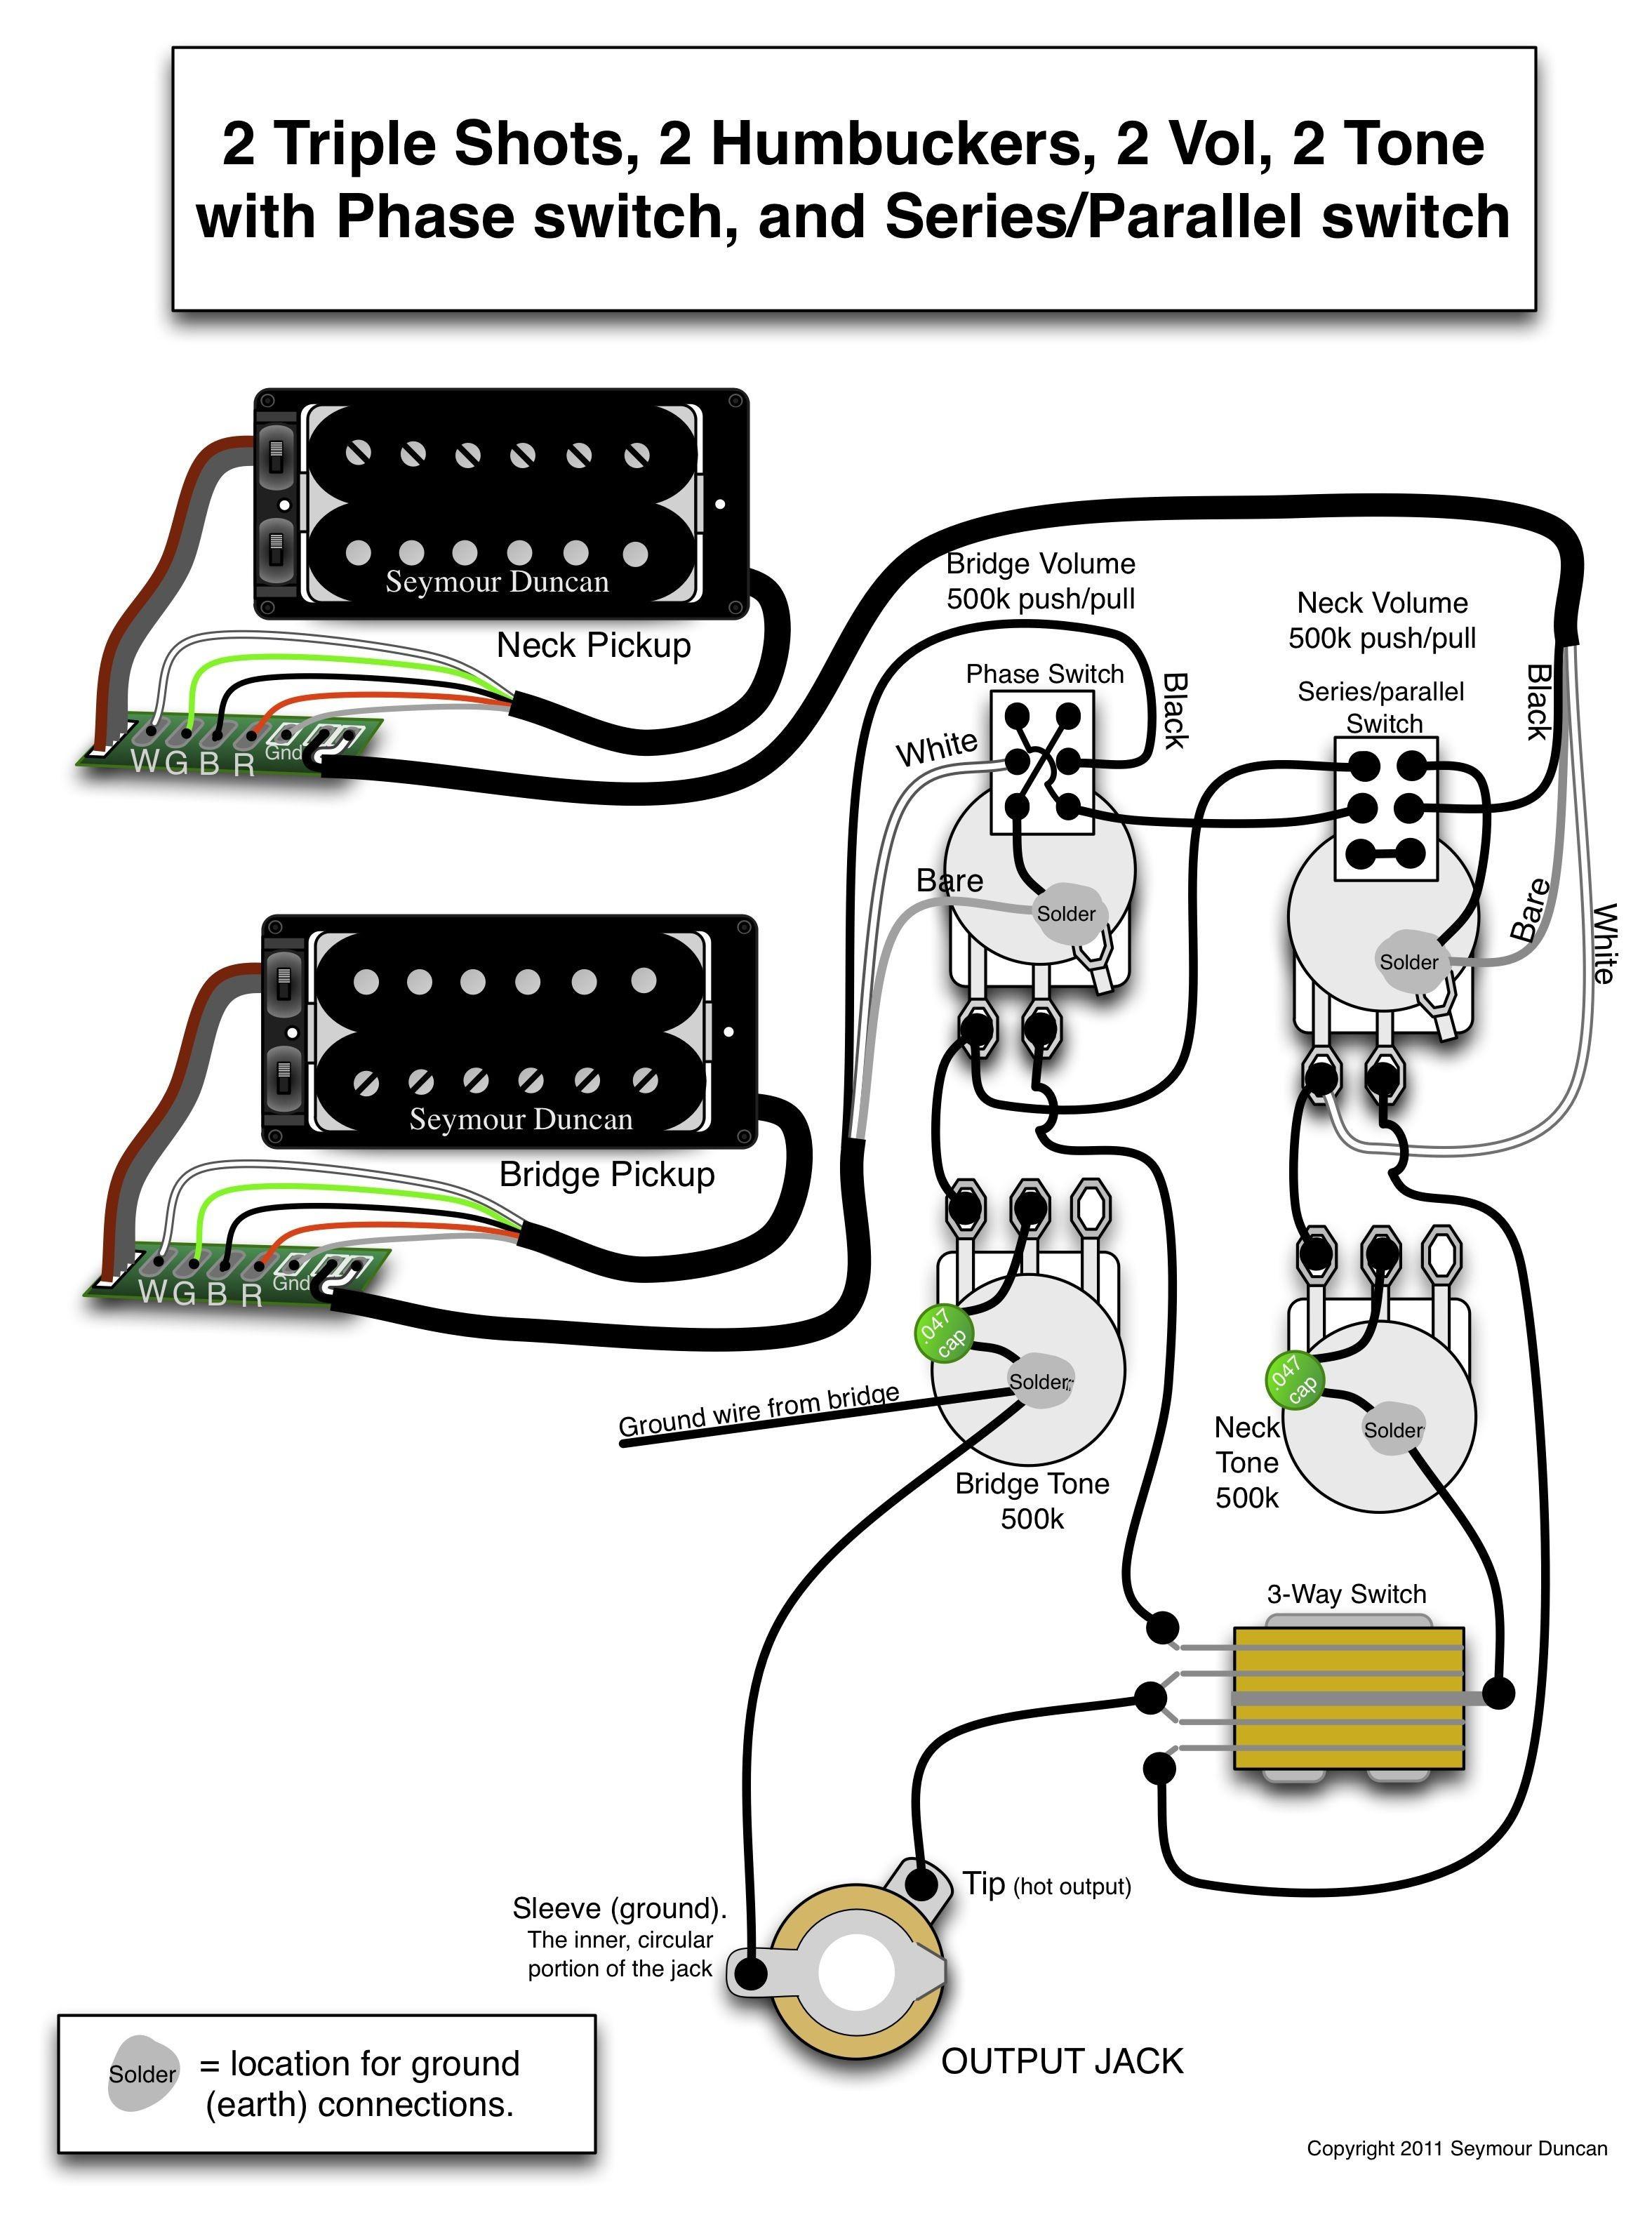 Guitar Volume Wiring Diagram Valid Seymour Duncan Wiring Diagram 2 Triple Shots 2 Humbuckers 2 Vol